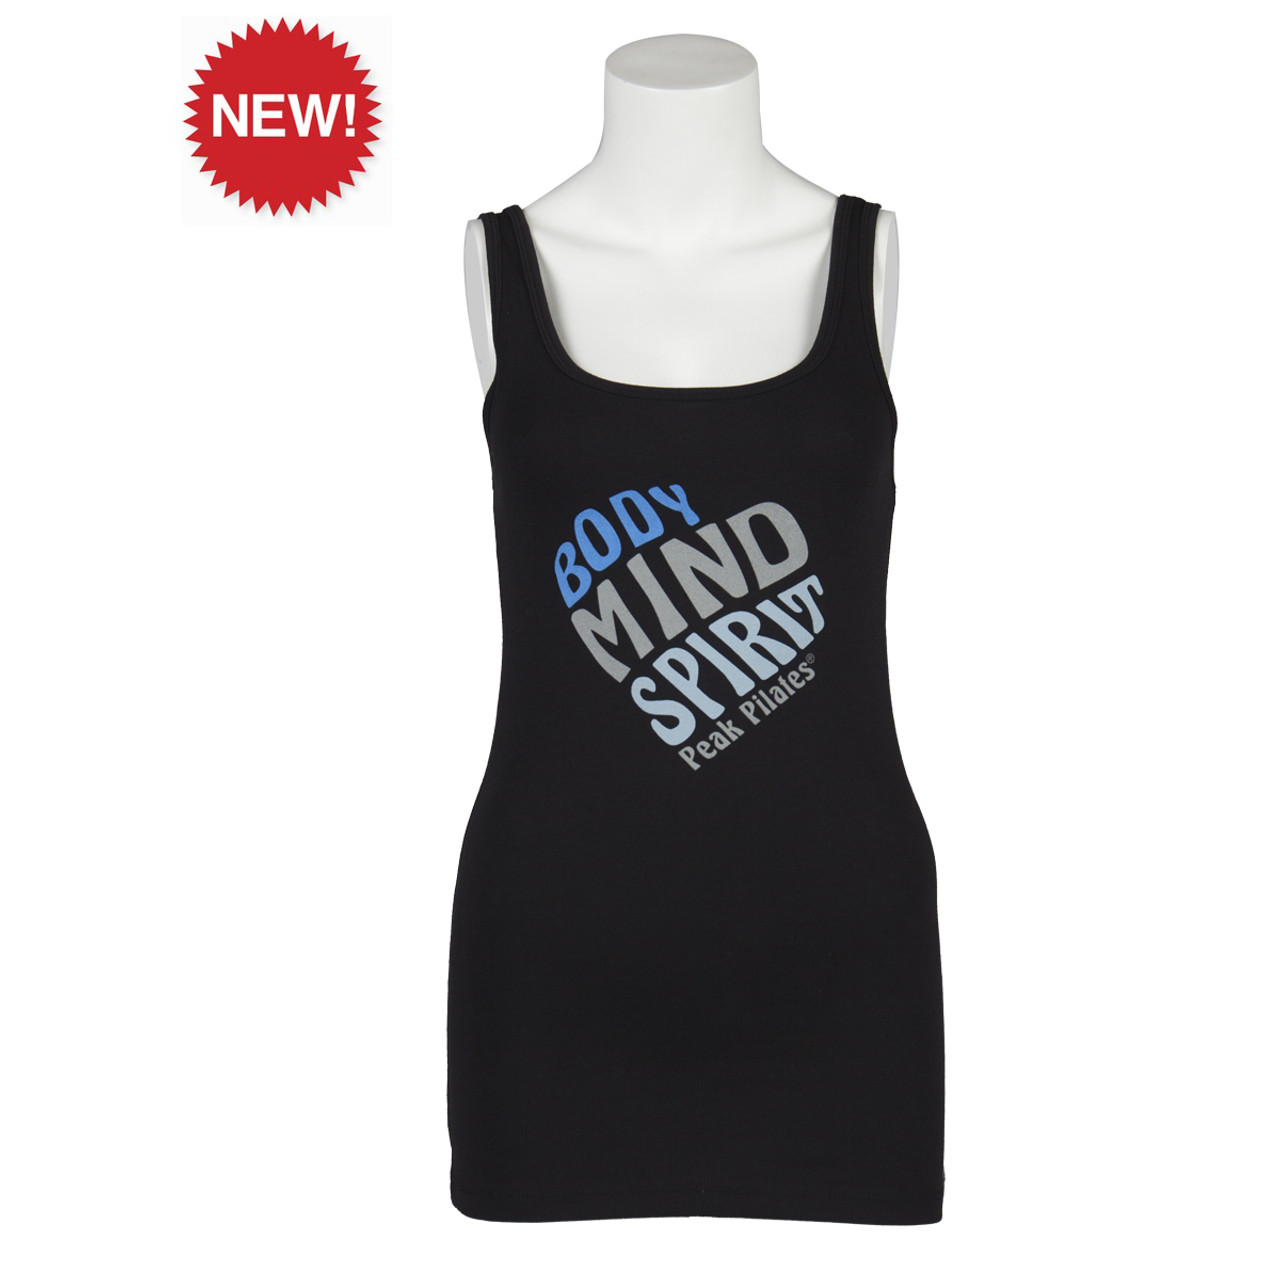 Body Mind Spirit Tank